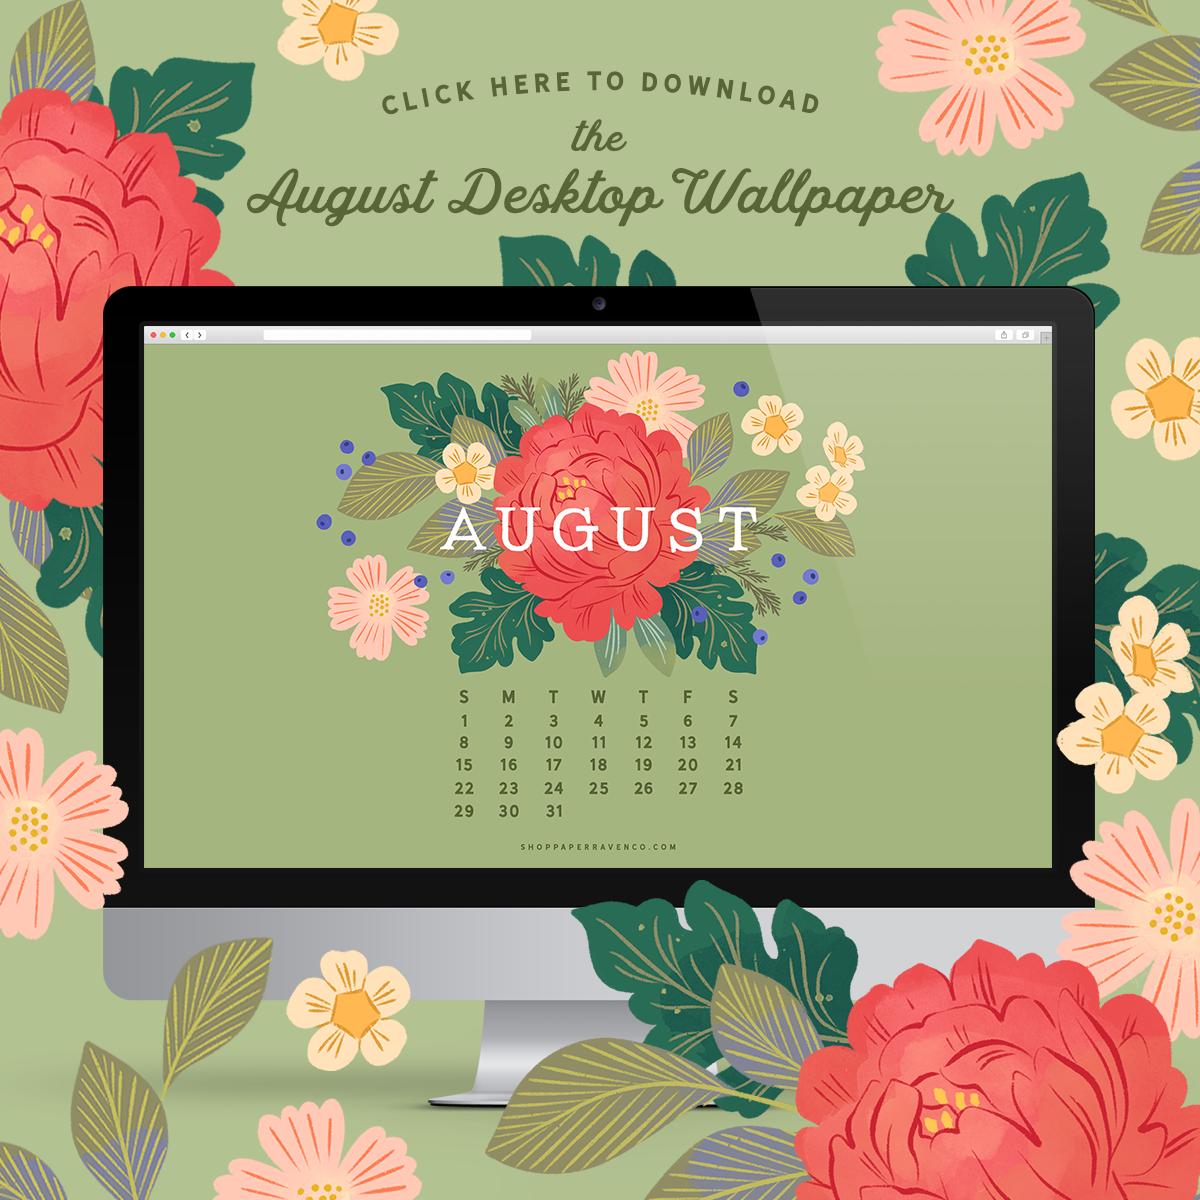 August 2021 Illustrated Desktop Wallpaper by Paper Raven Co. #dressyourtech #desktopwallpaper #desktopdownload